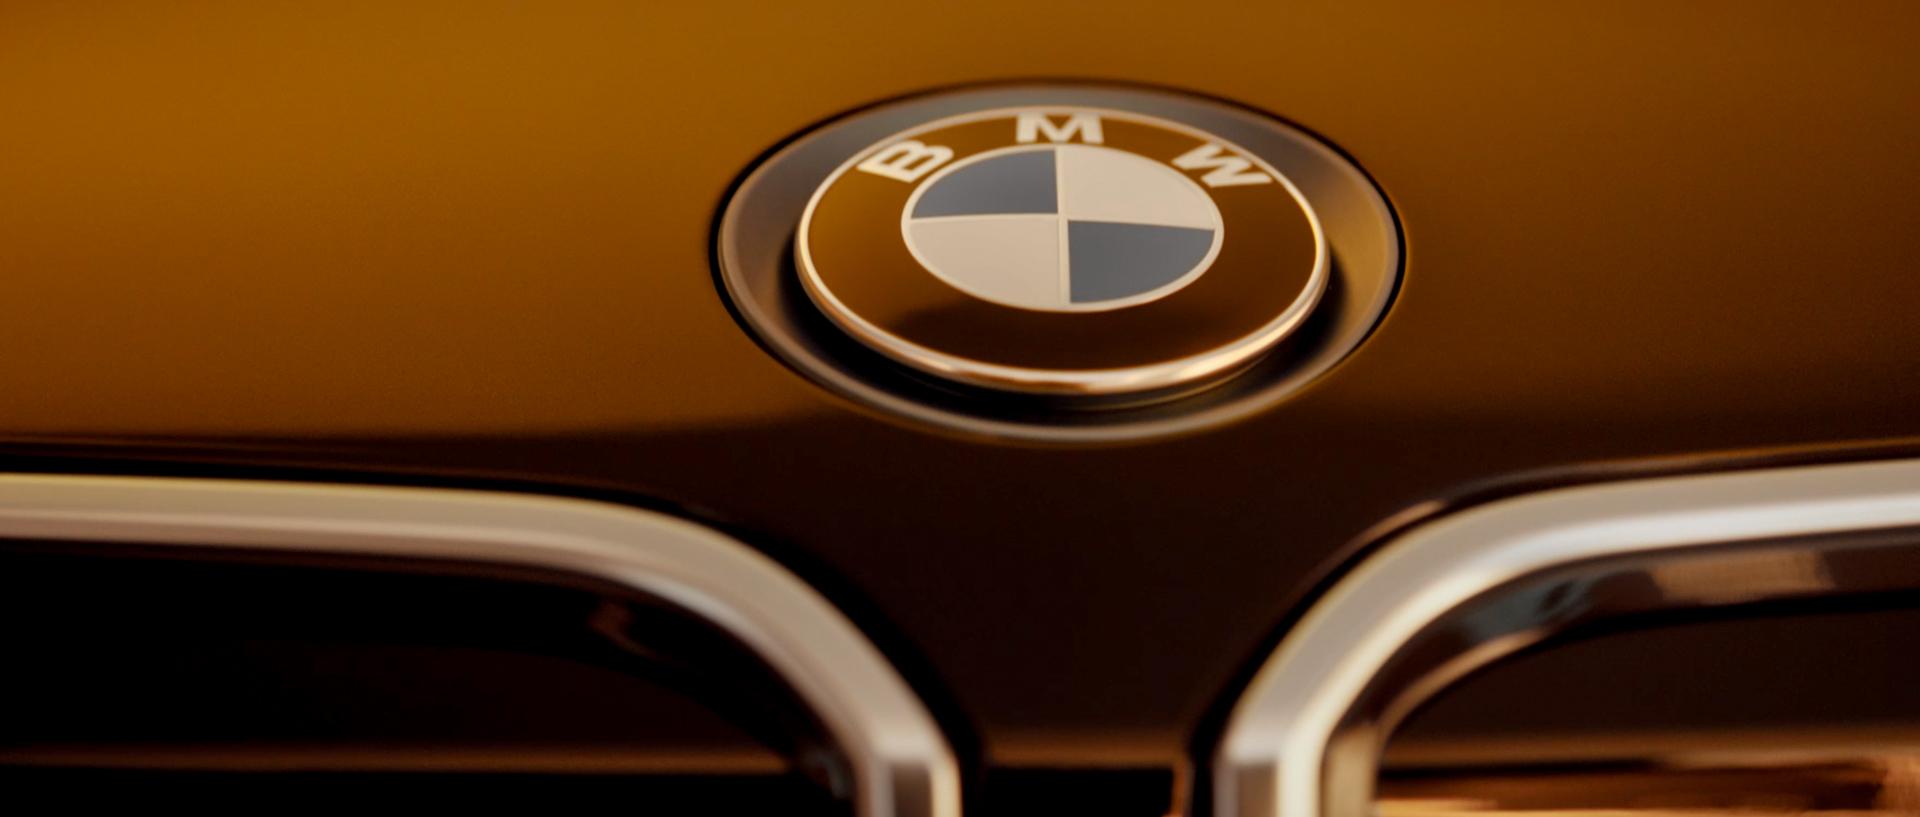 BMW-ForSite-Temp-5.jpg